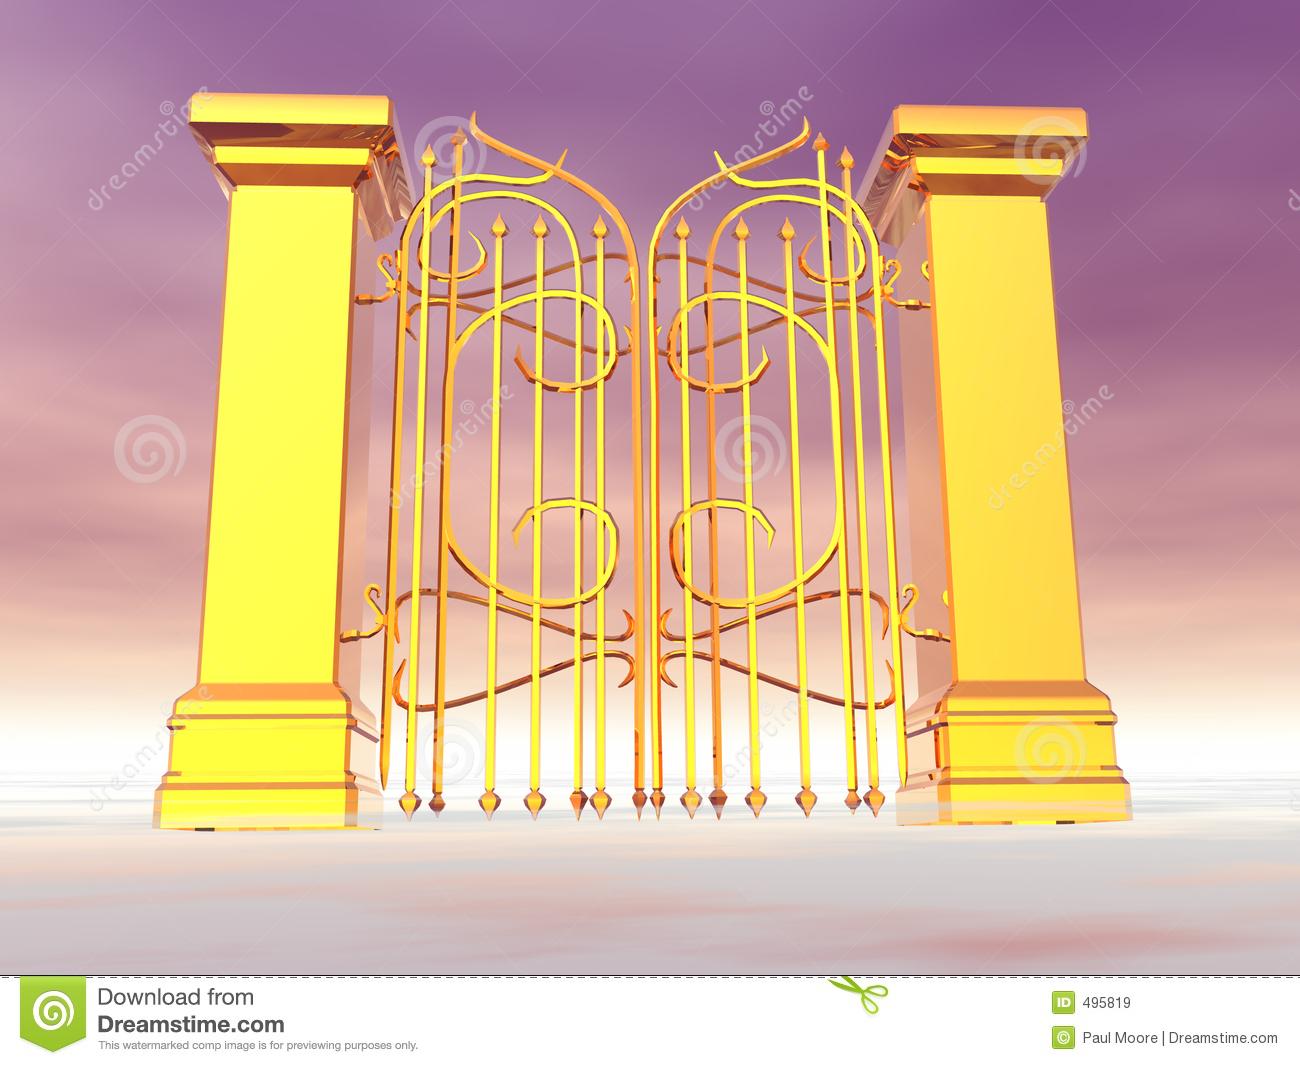 free clipart gates - photo #43